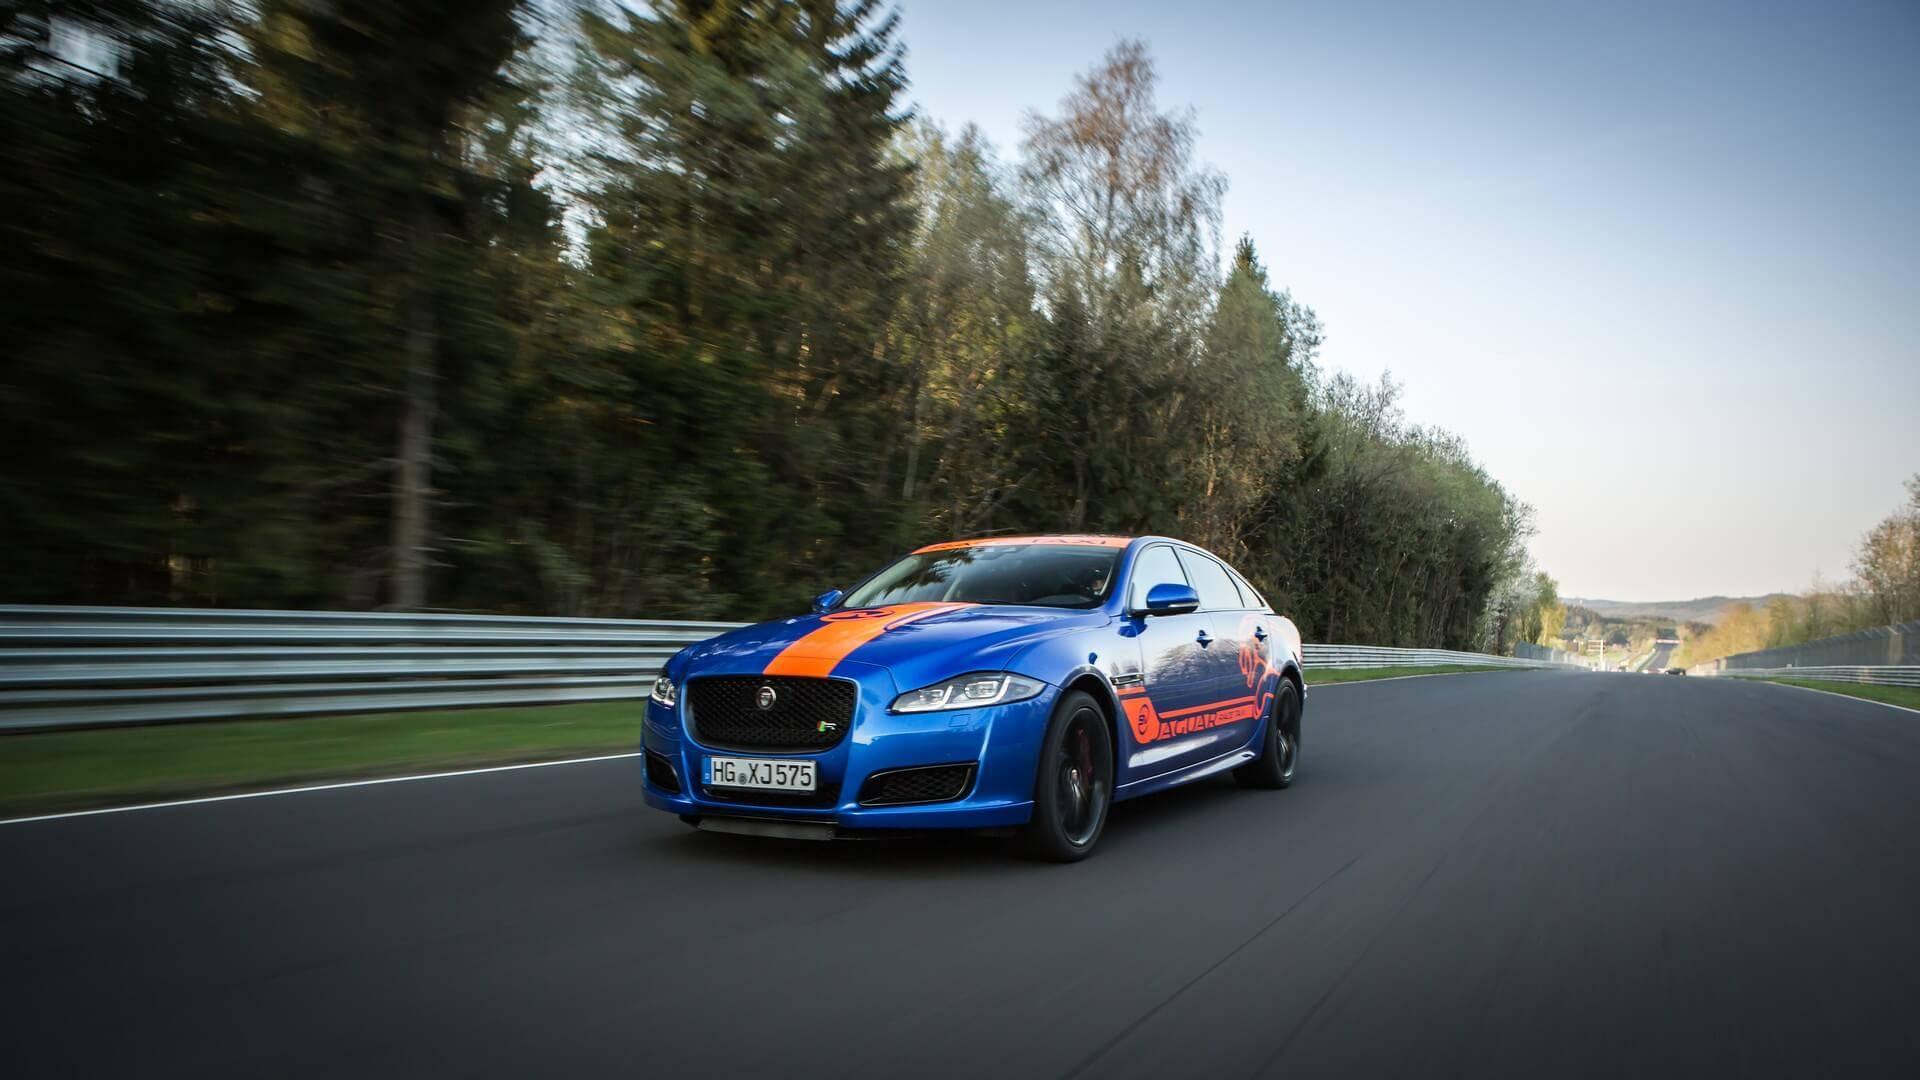 Jaguar_Nurburgring_taxi_0007